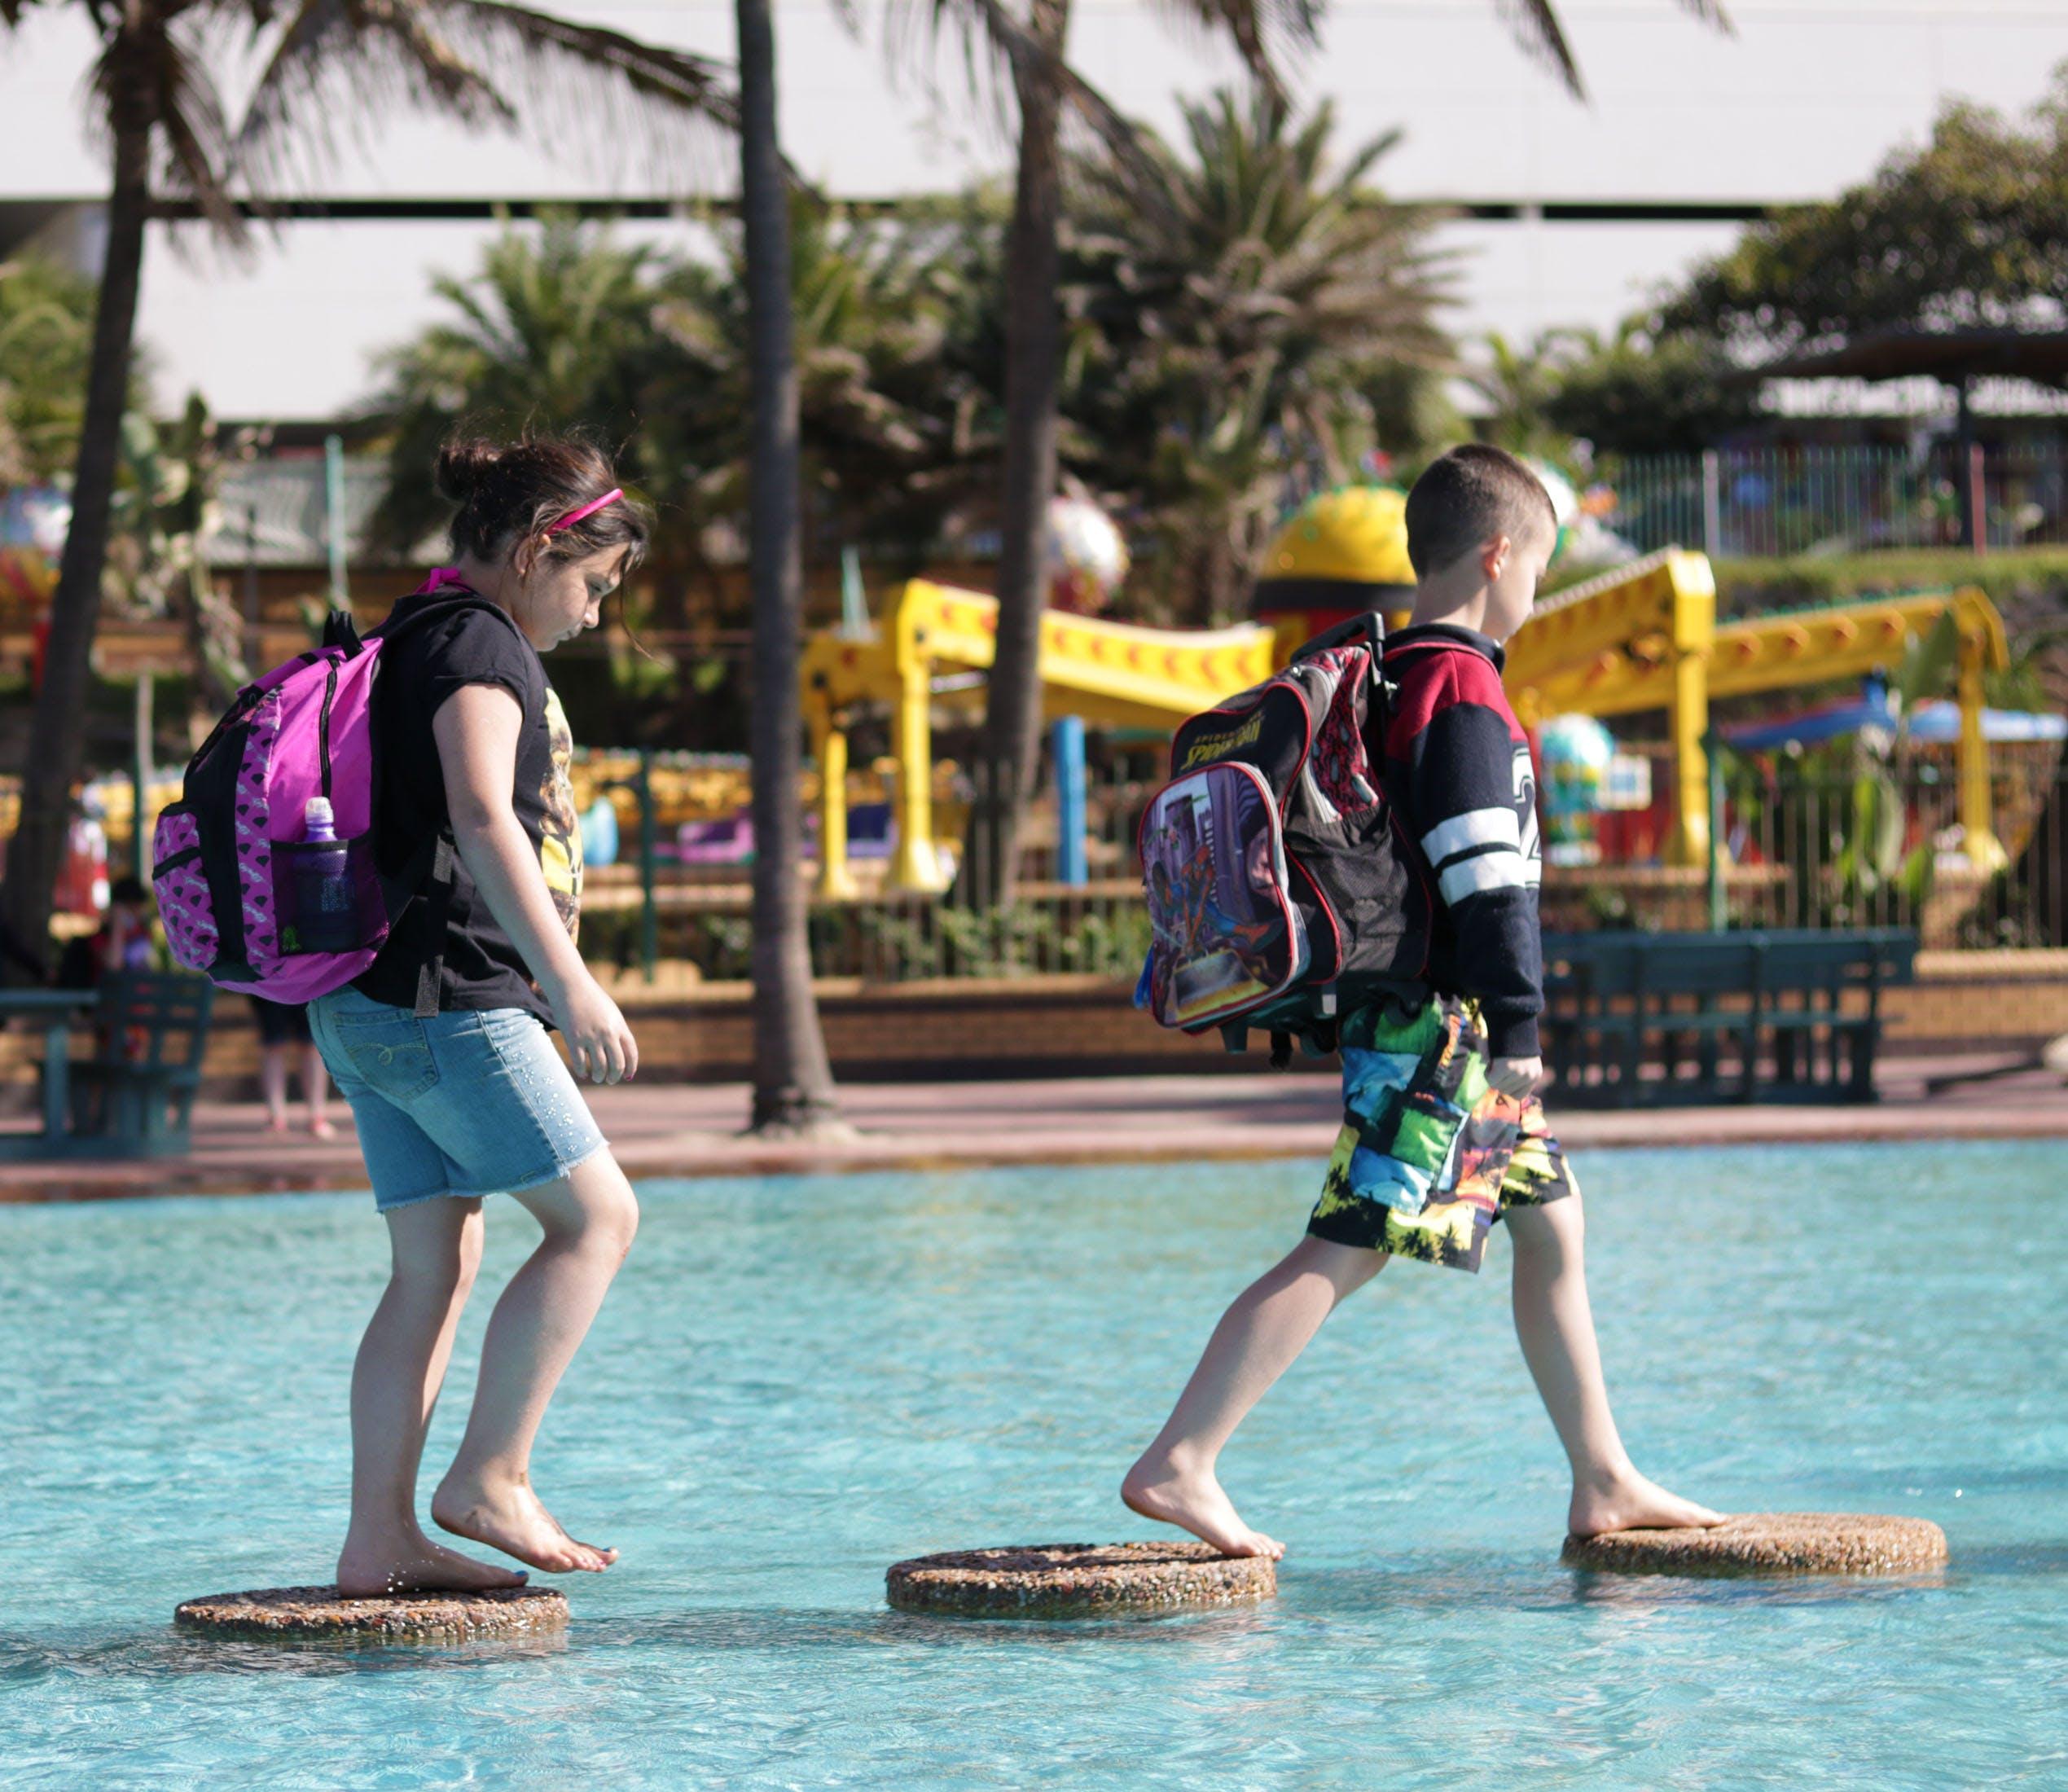 Free stock photo of children walking on water